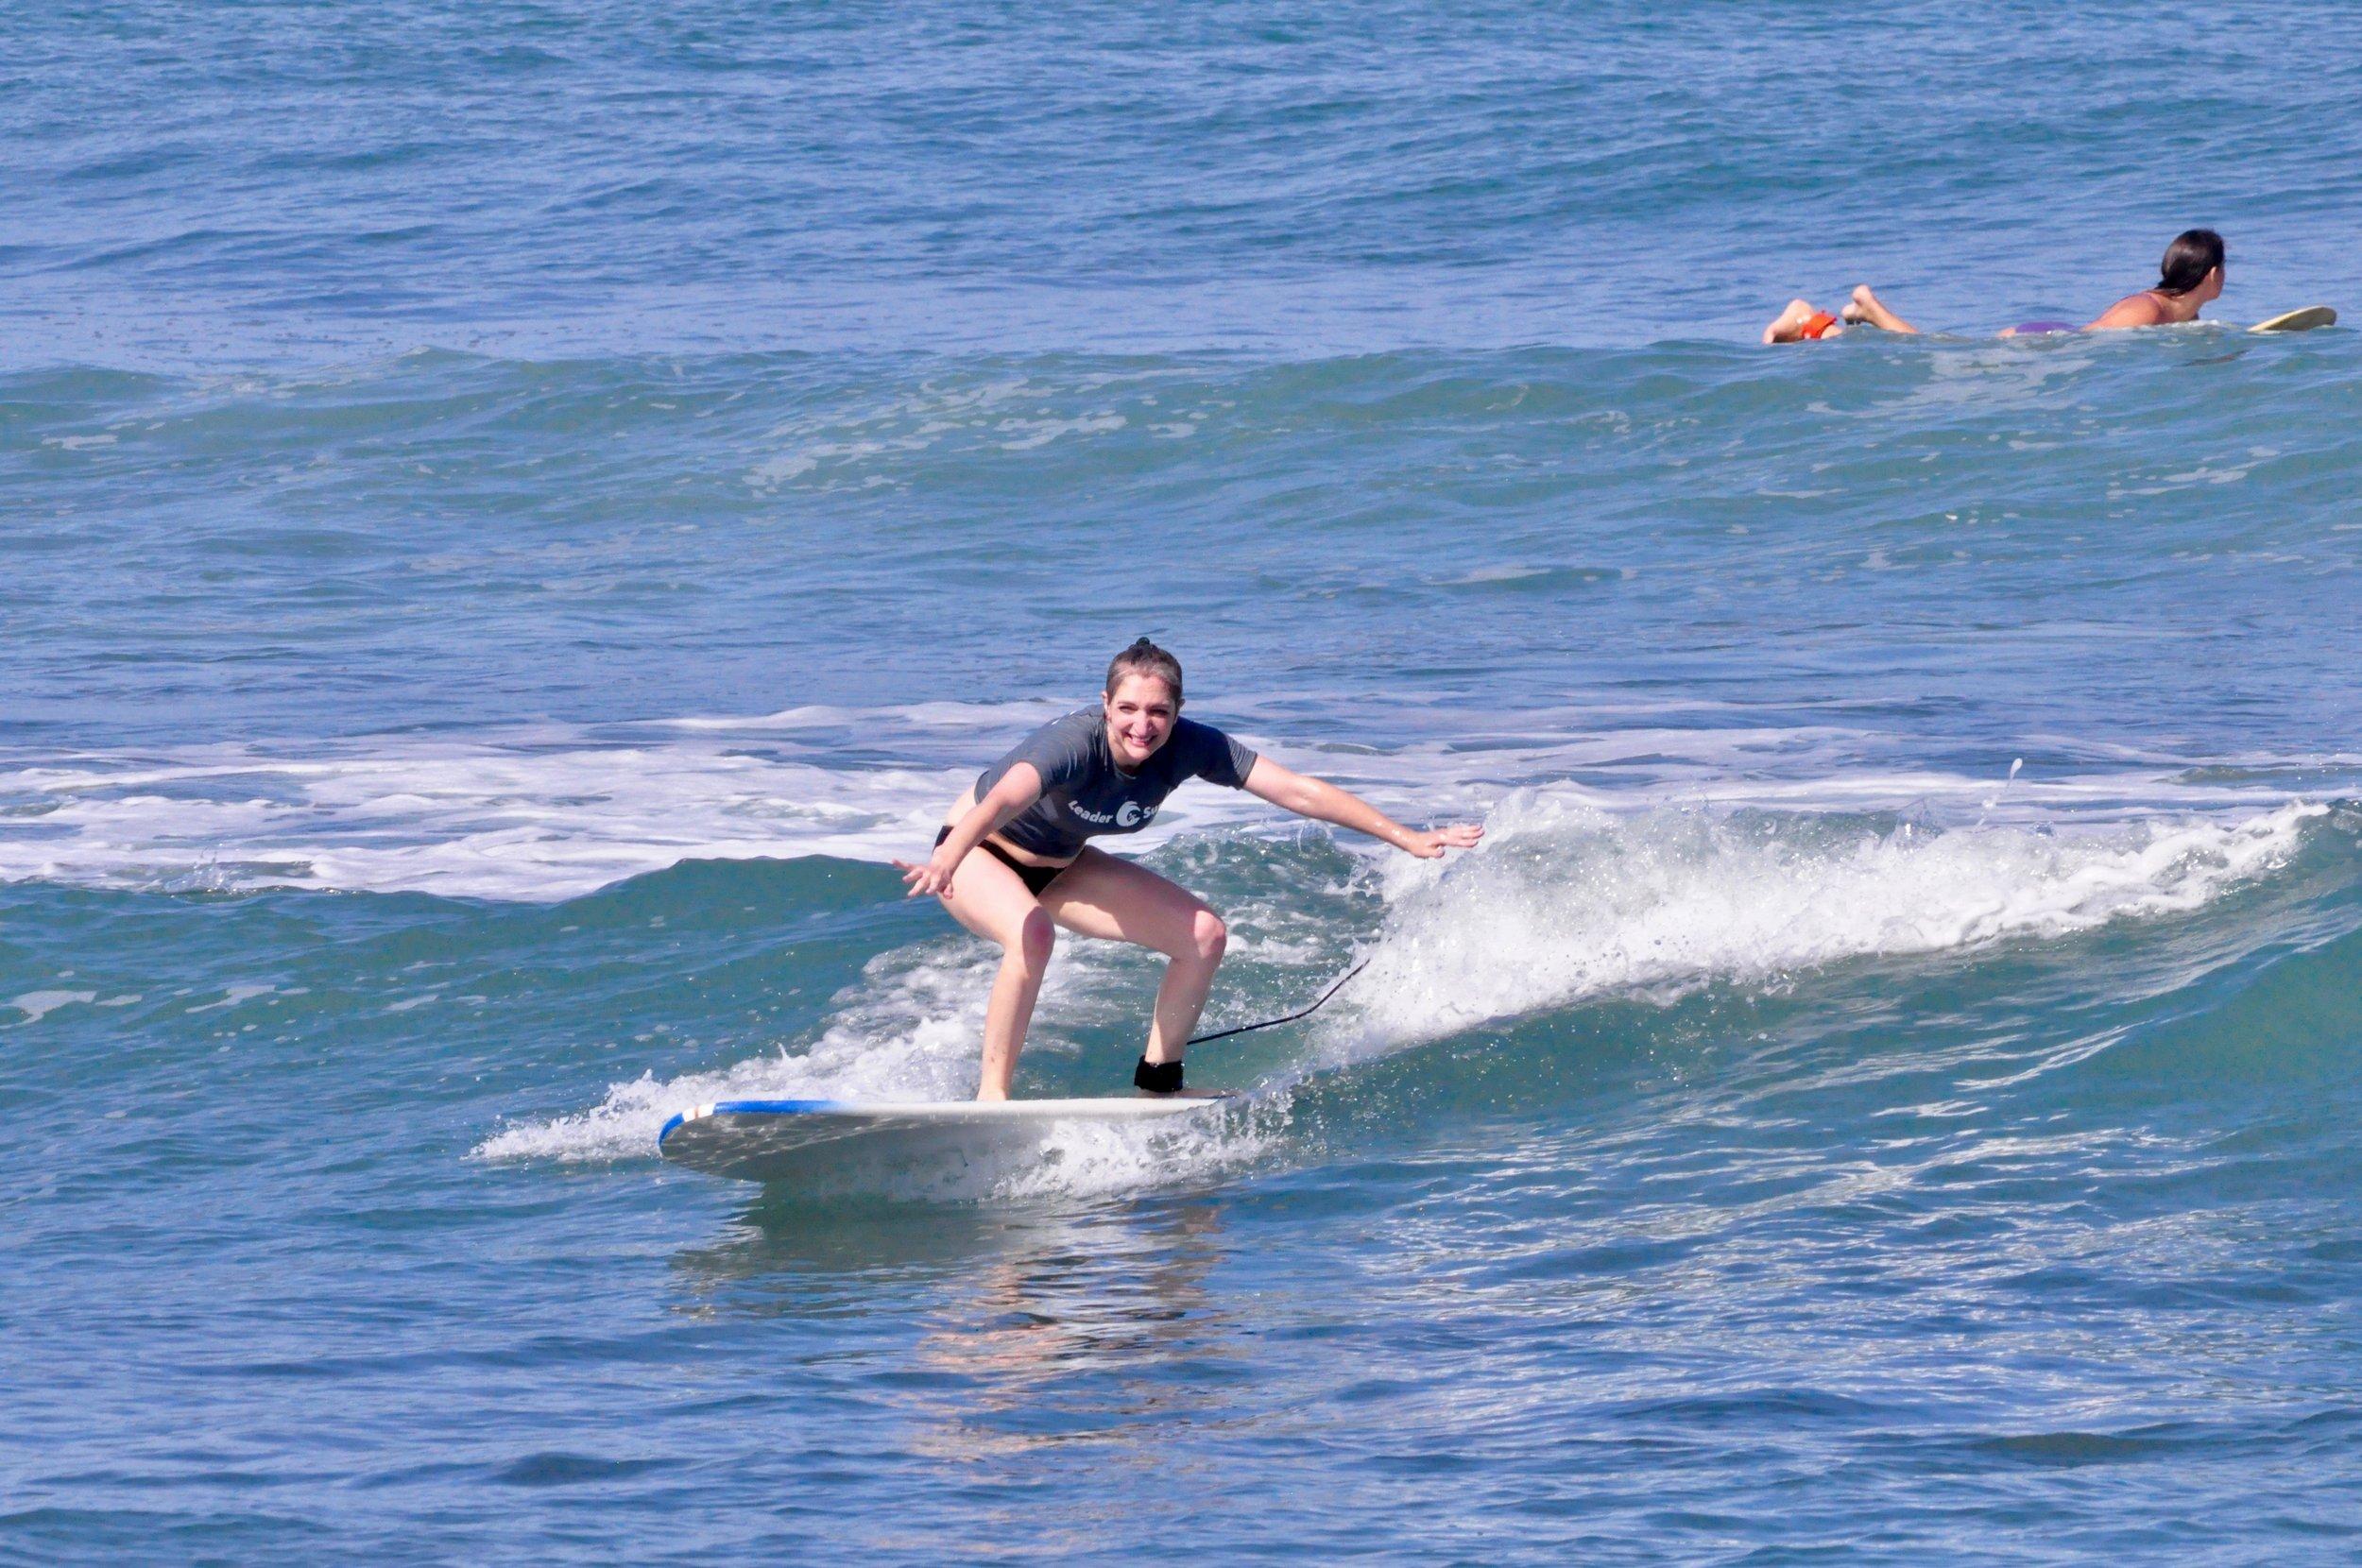 Ally riding a wave